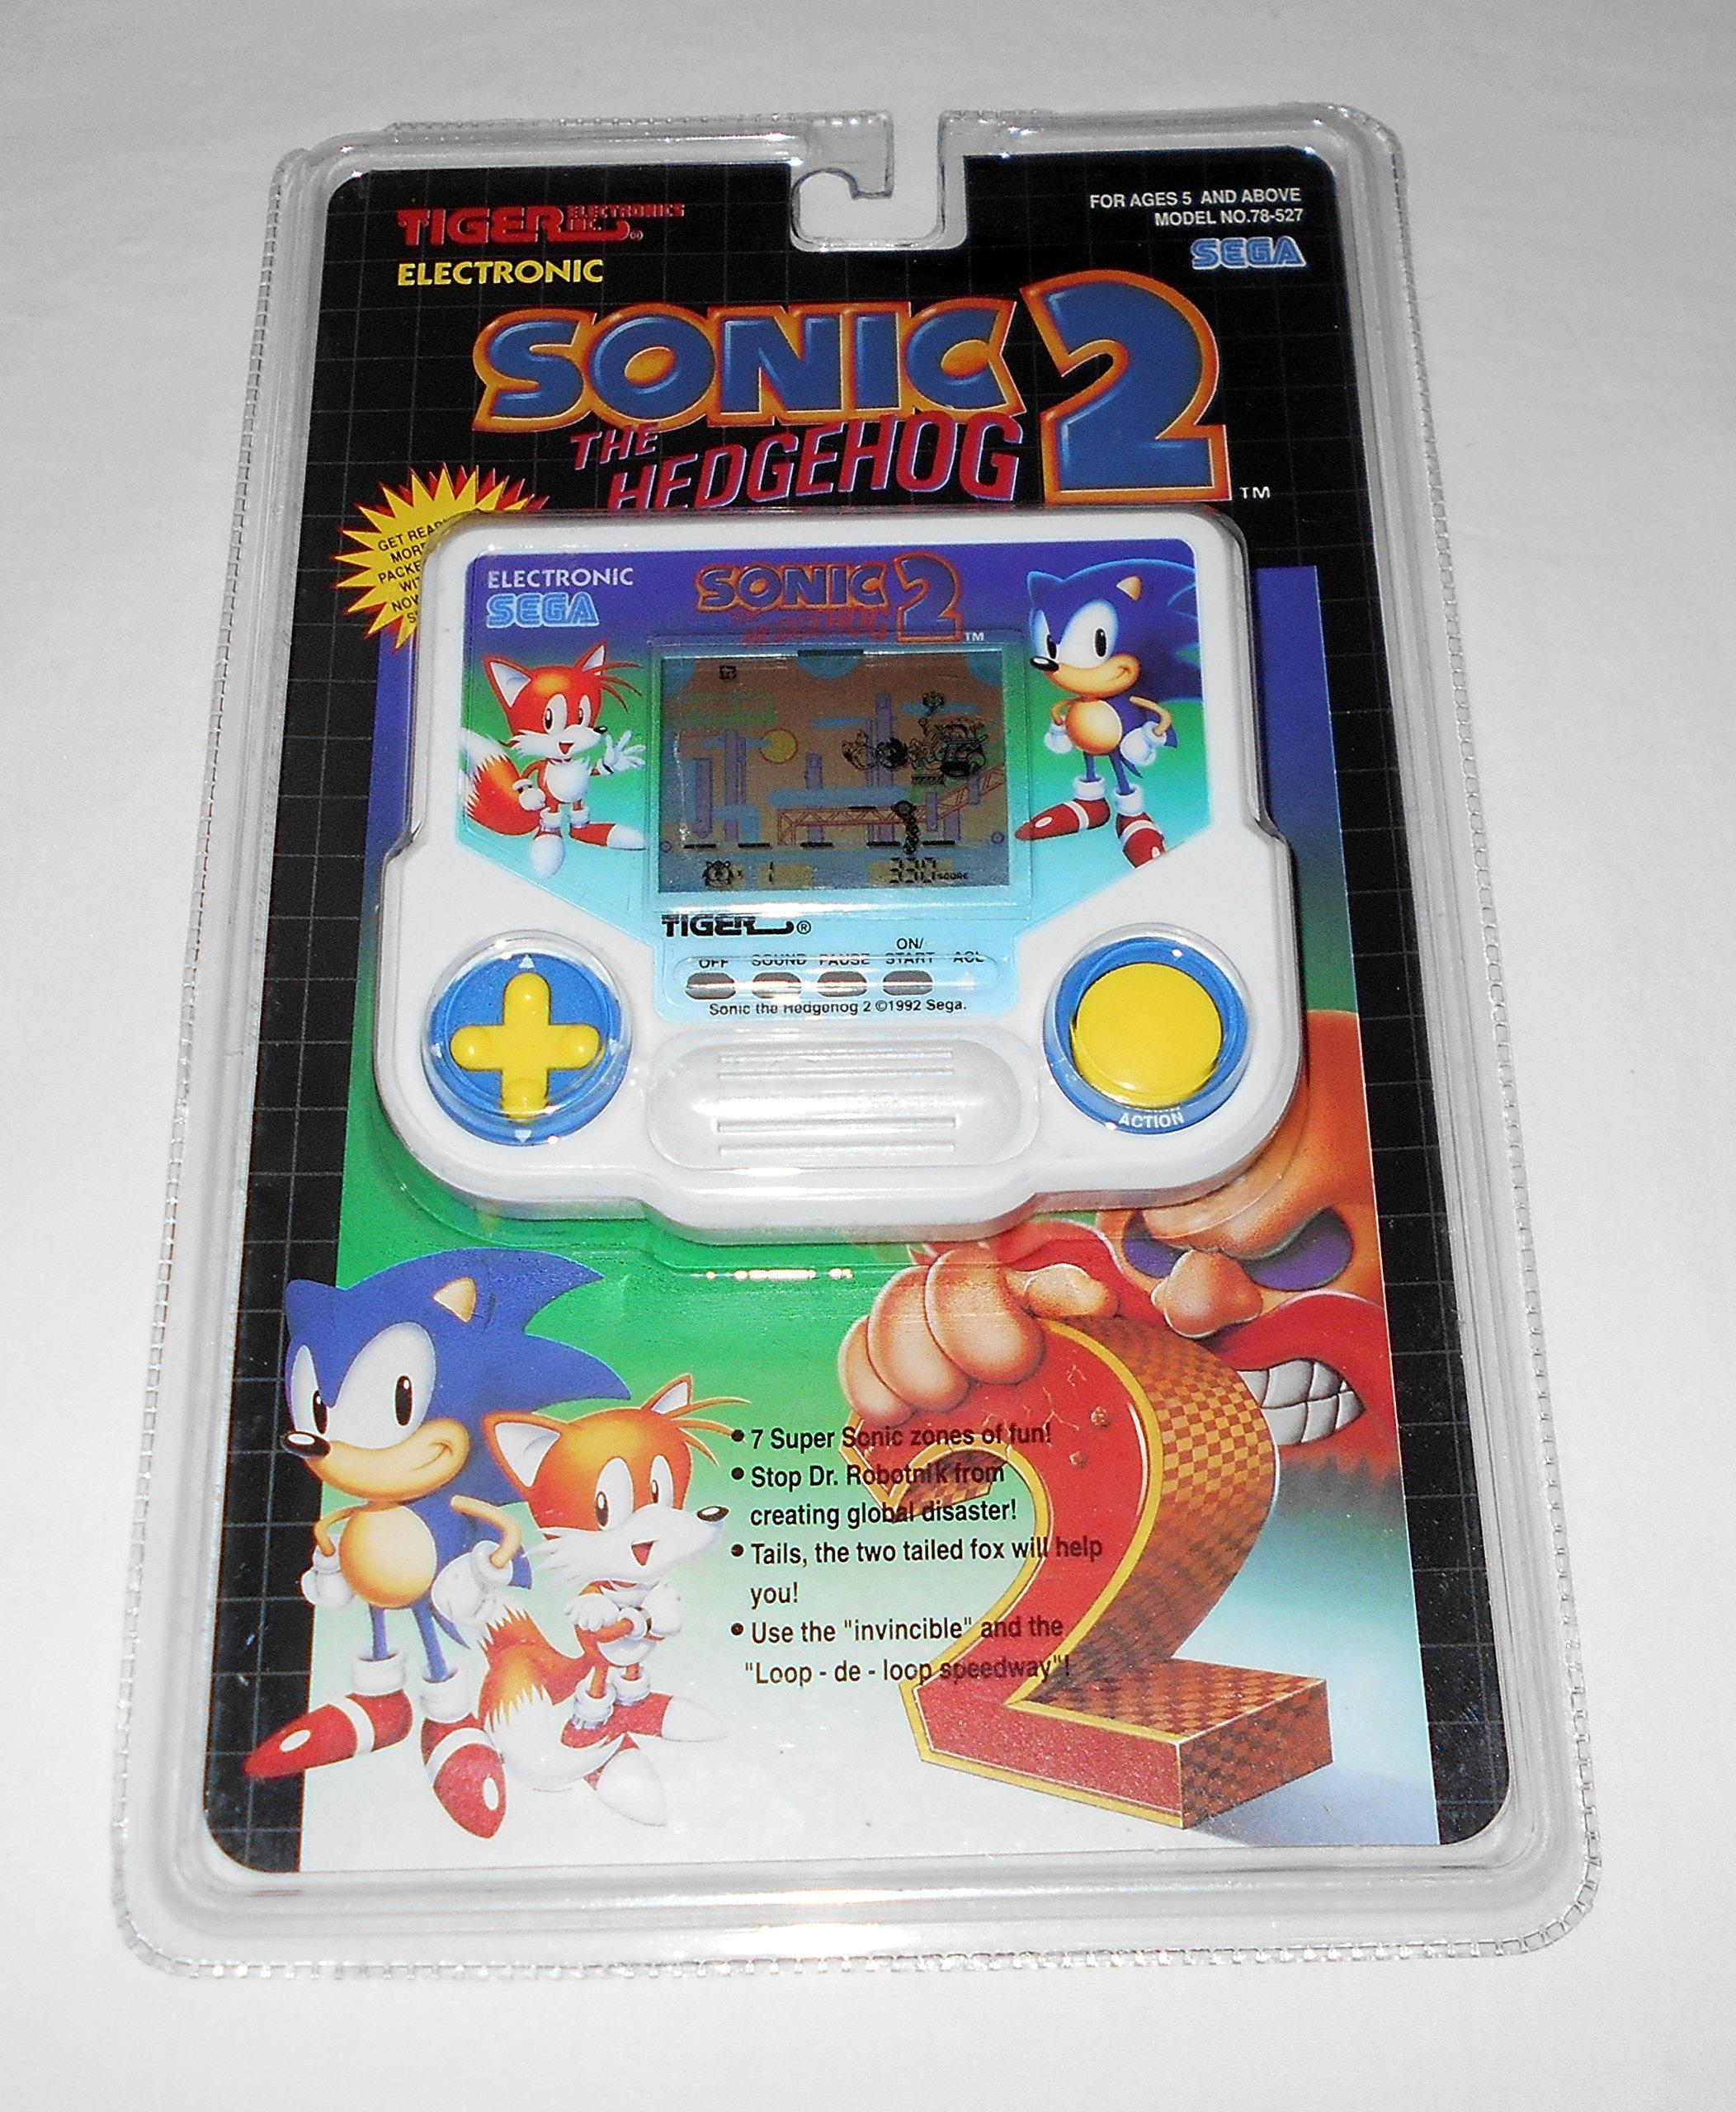 File:Sonic2LCDBox.jpg